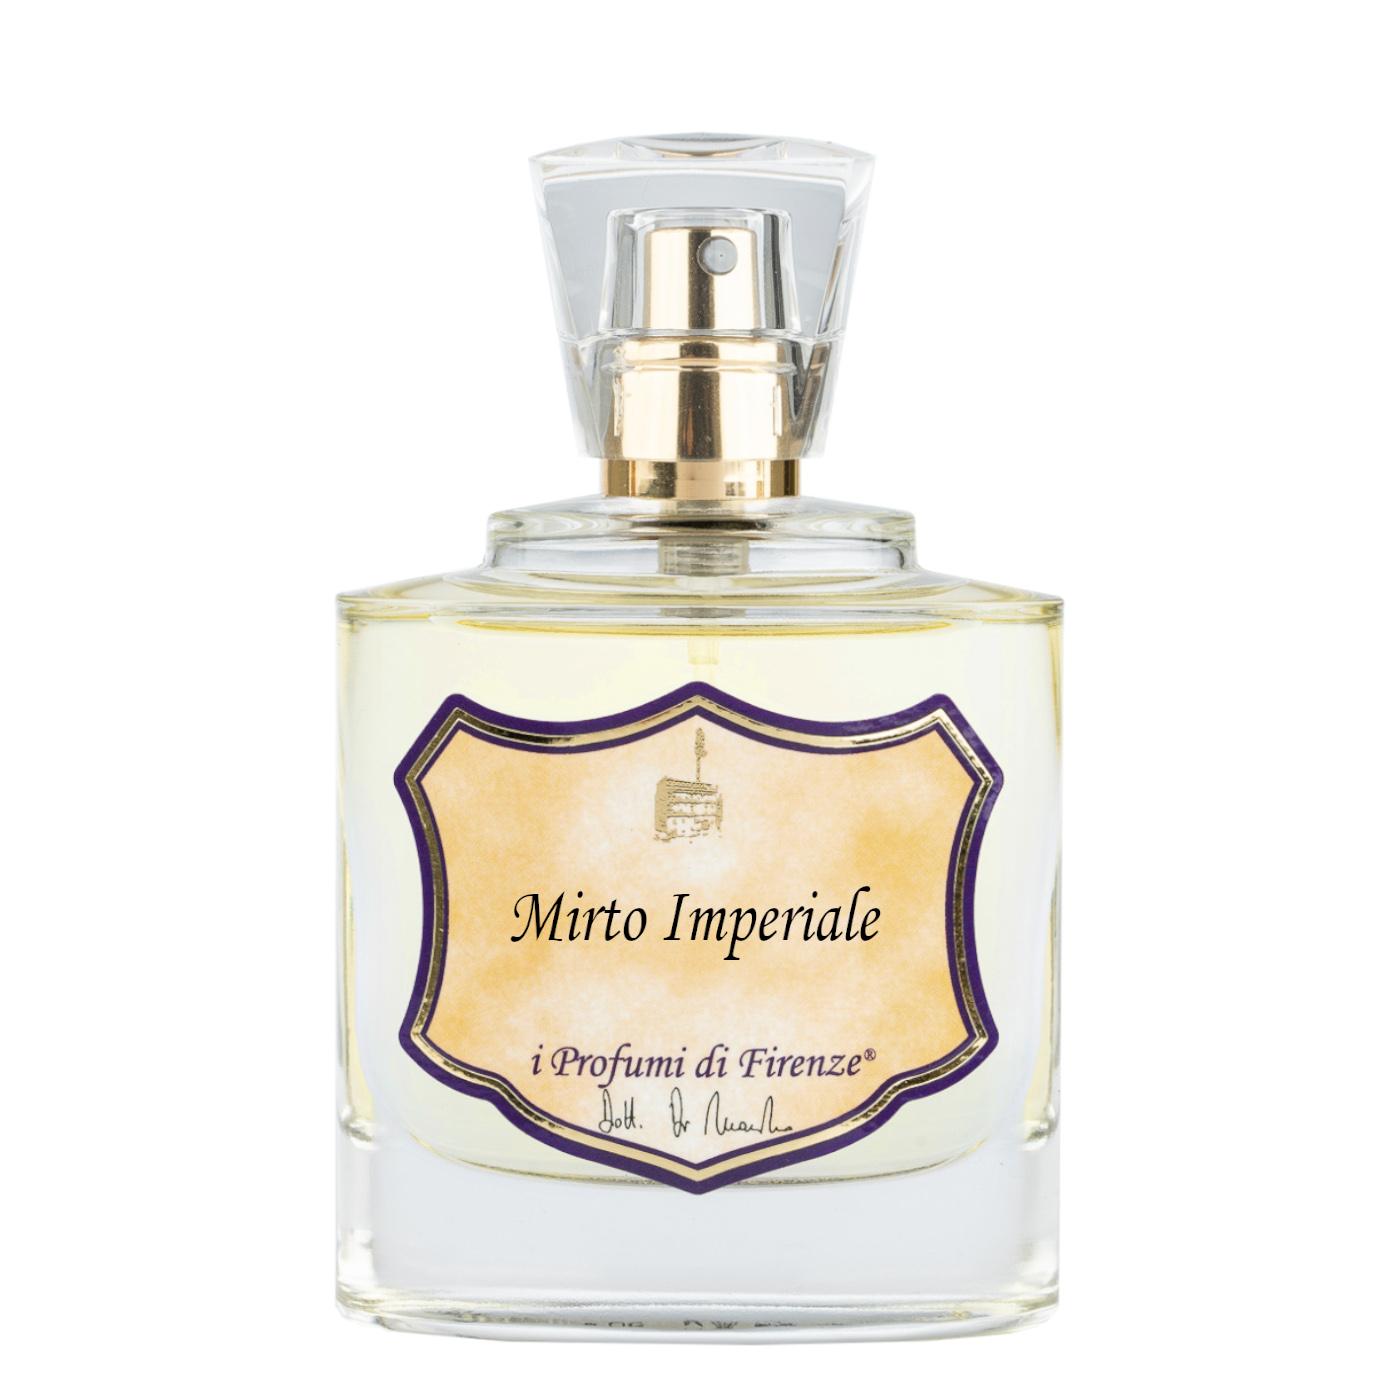 MIRTO IMPERIALE - Eau de Parfum-0